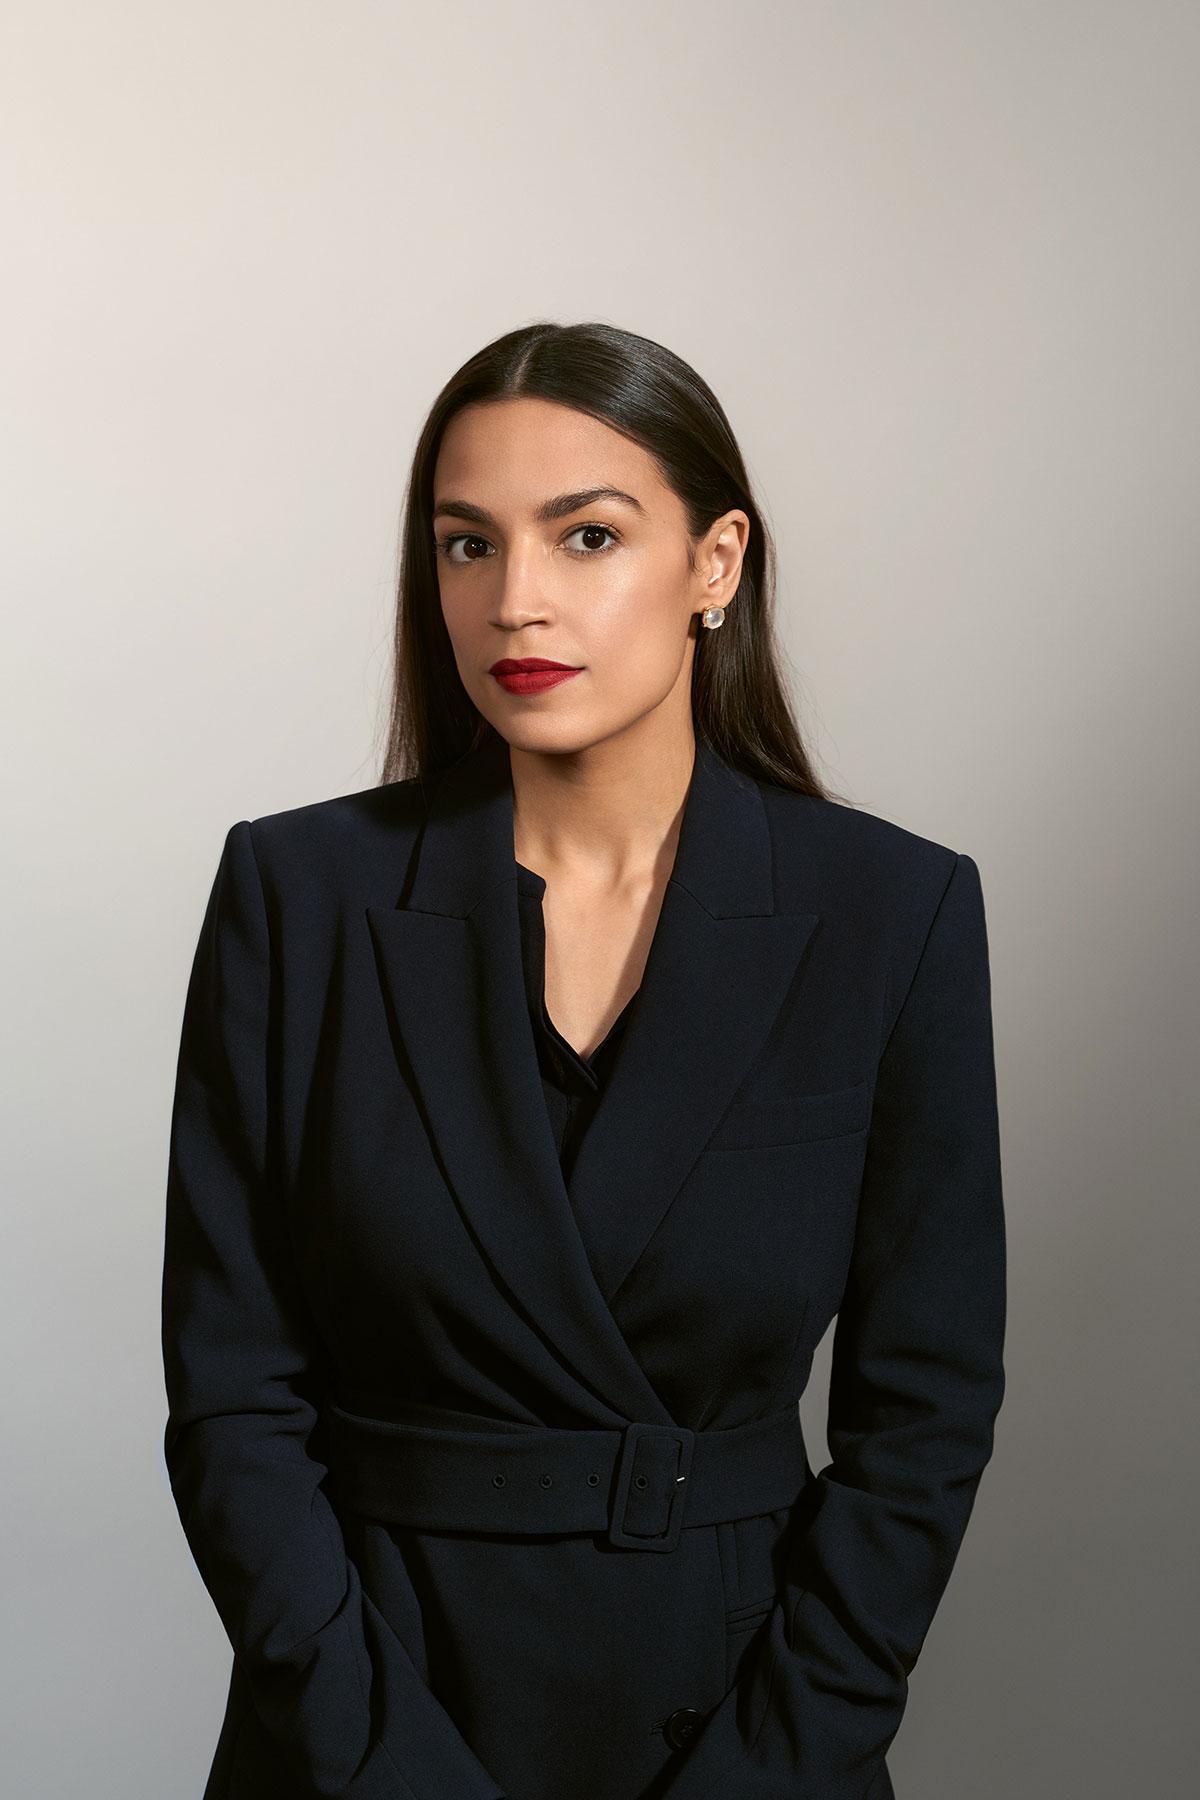 U.S. Representative Alexandria Ocasio-Cortez